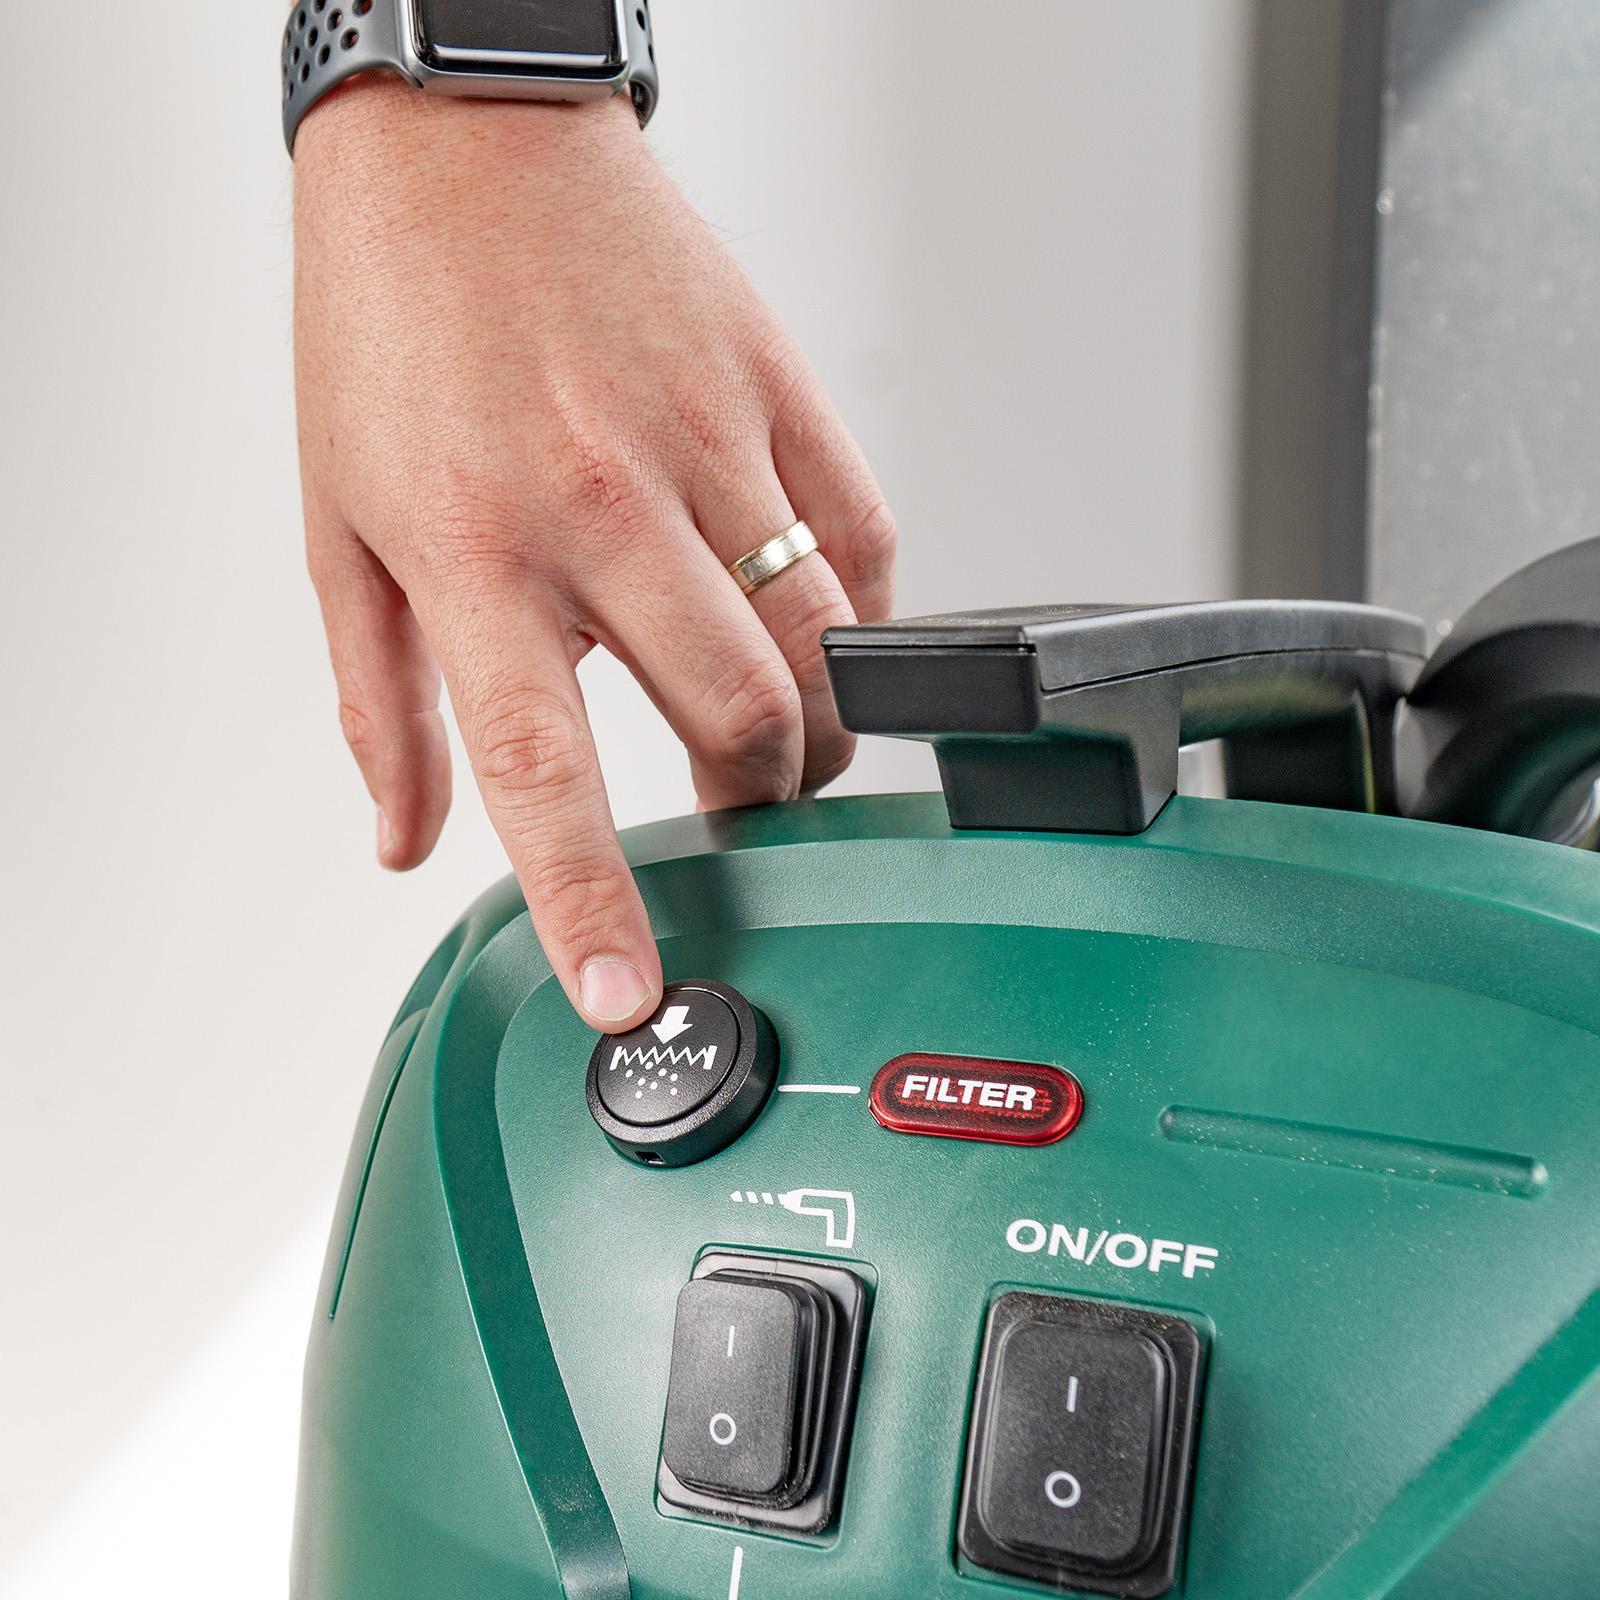 Gerni 9000 - Filter Clean Button